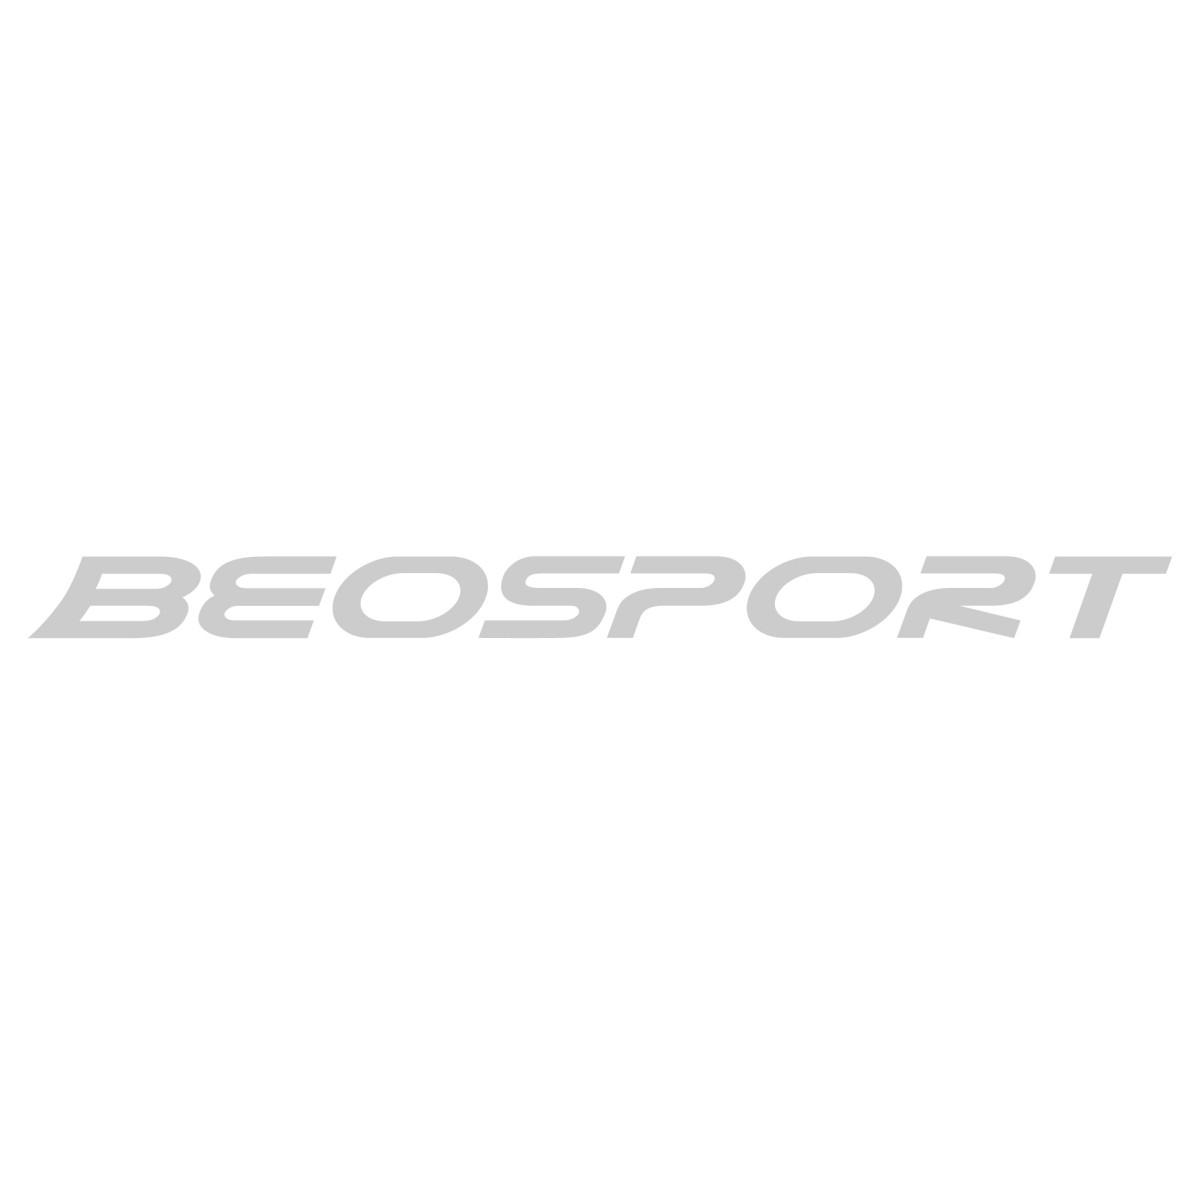 "Wilson Scb 17 11"" softball loptica"